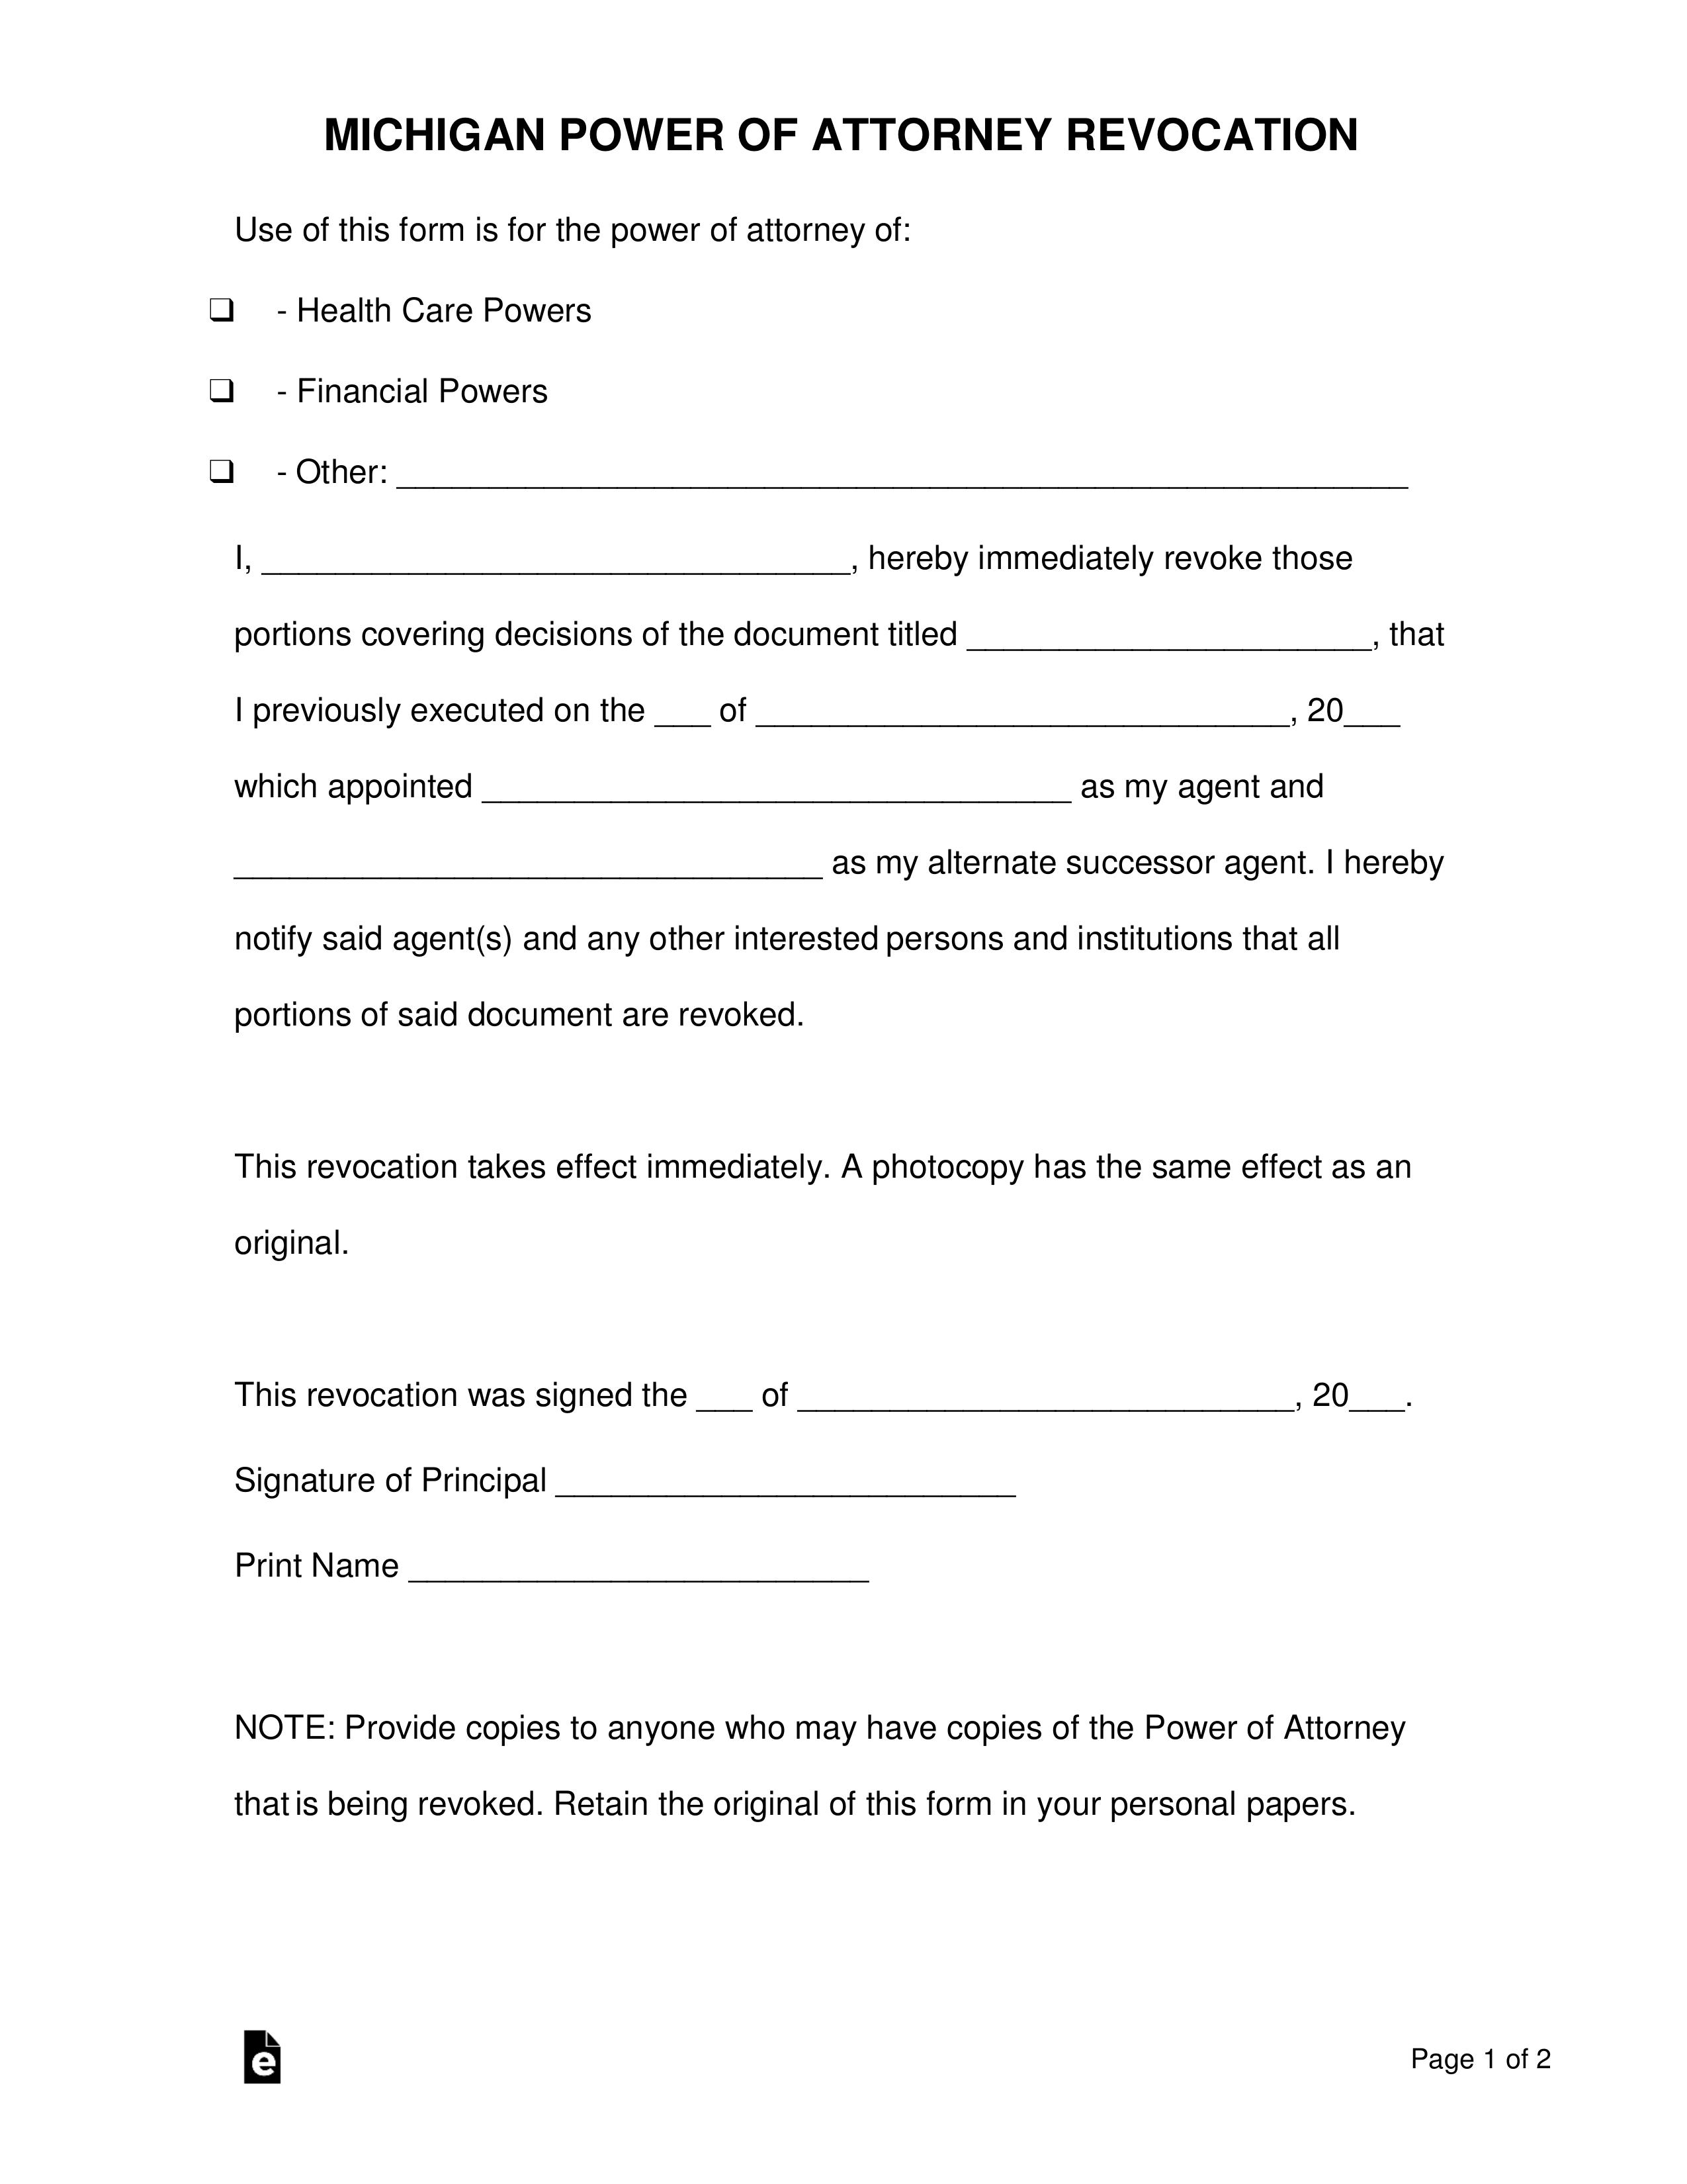 Free Michigan Power Of Attorney Revocation Form PDF